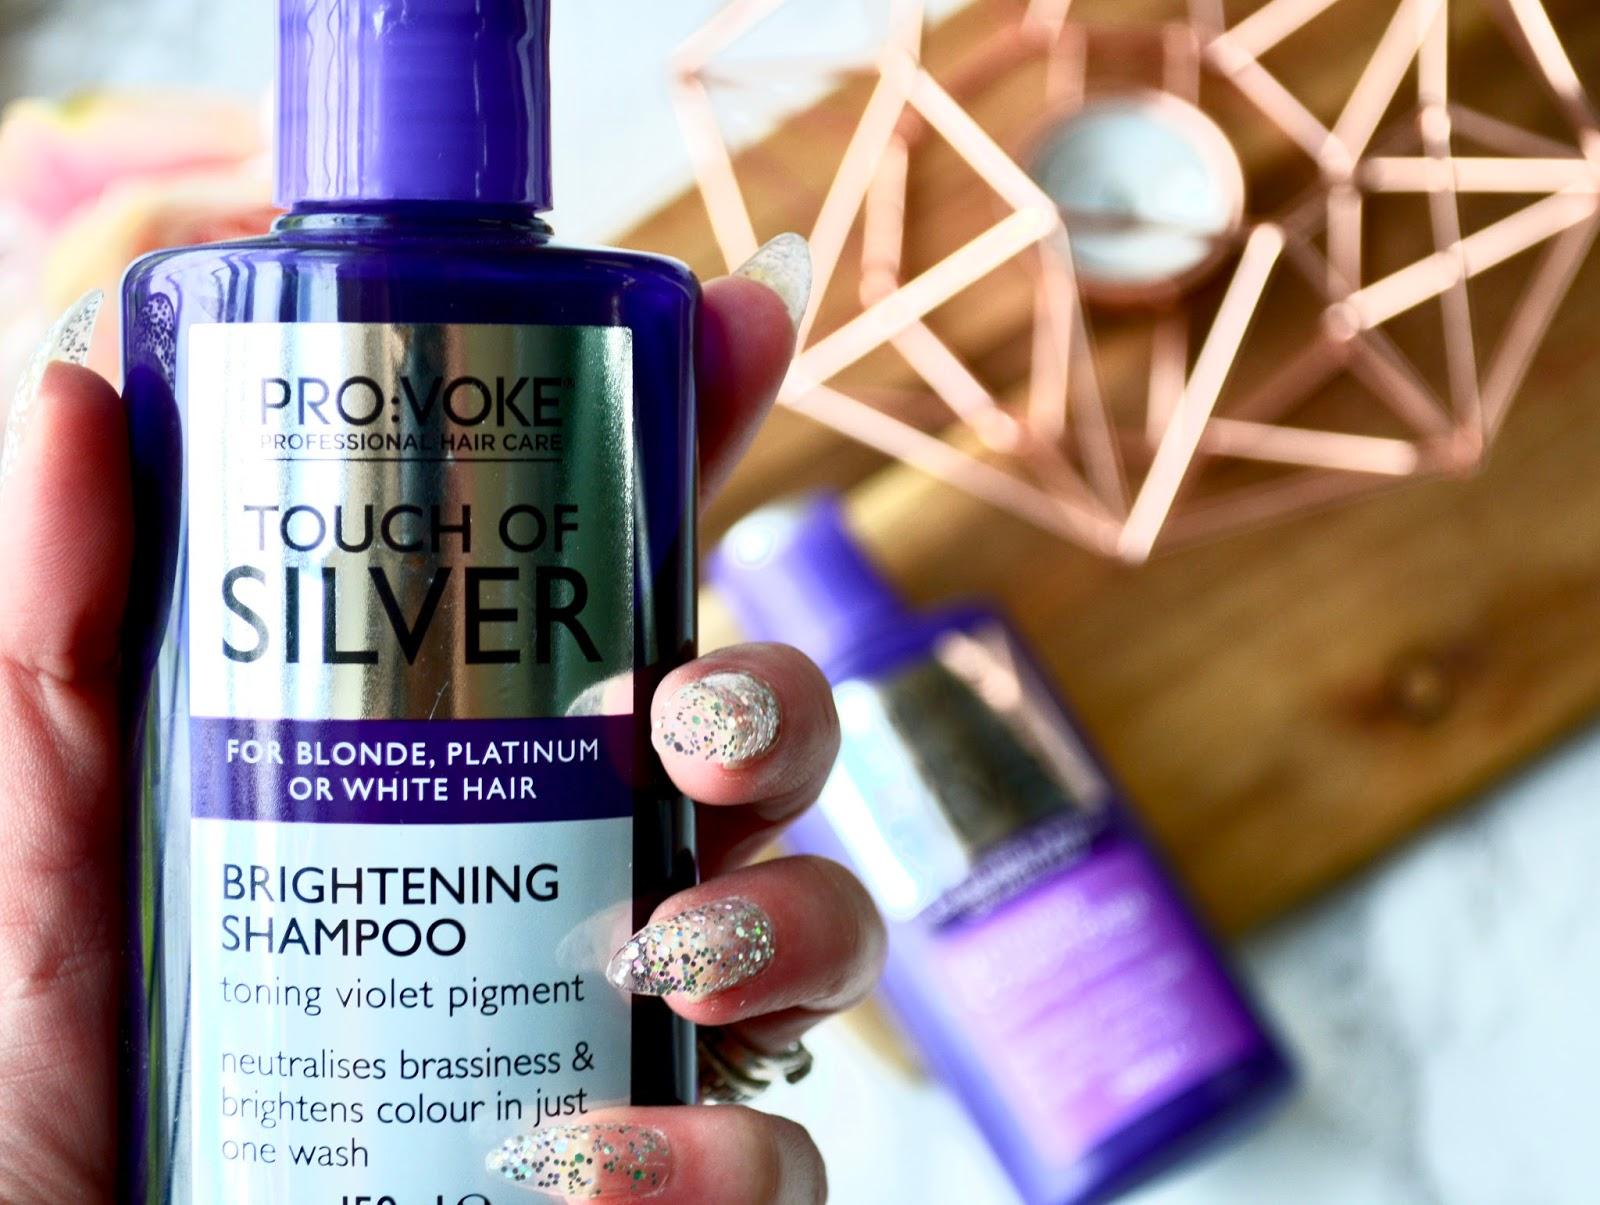 PROVOKE Touch Of Silver Shampoo & Conditioner